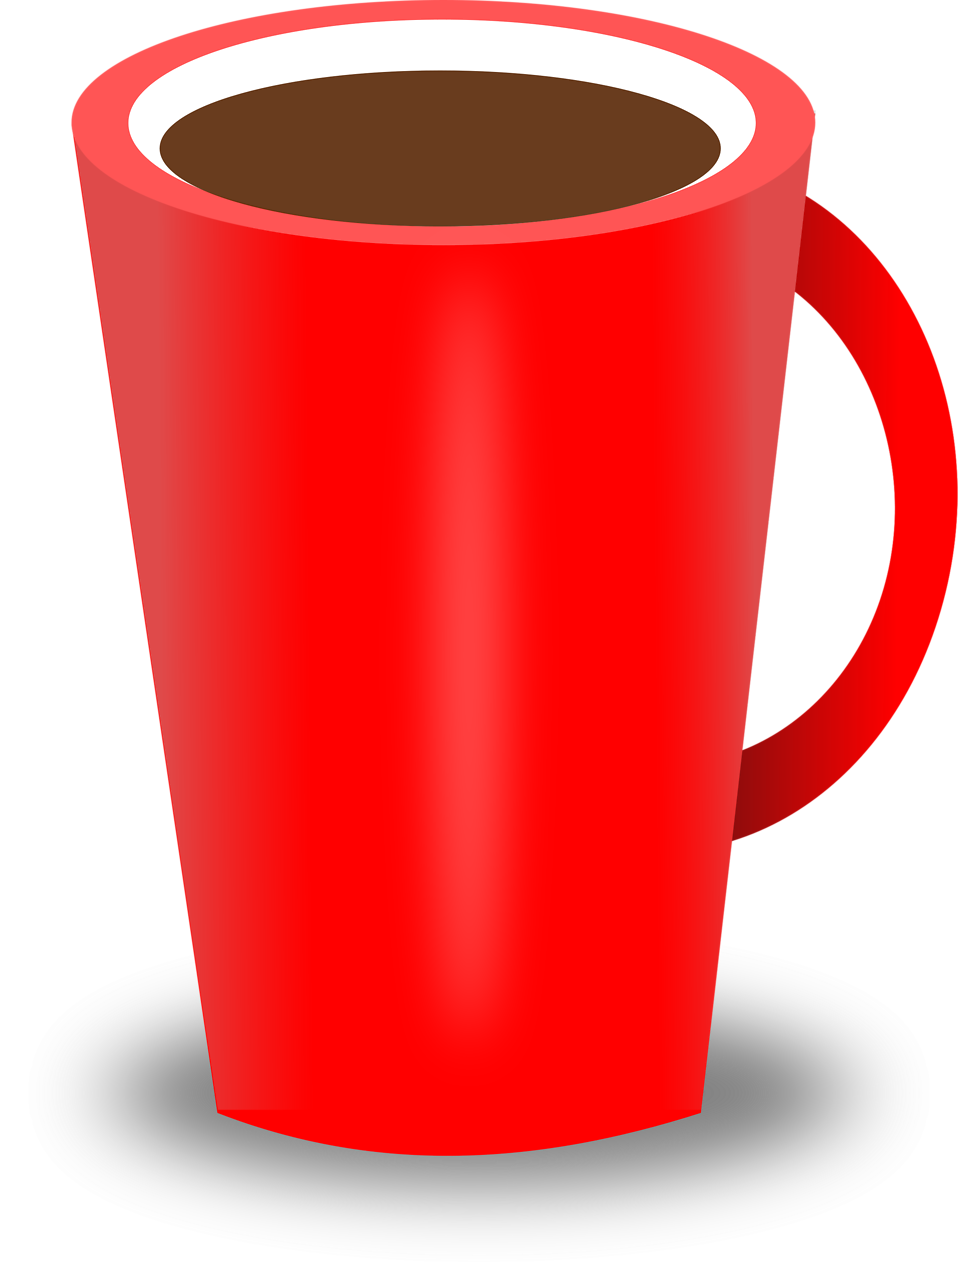 Free stock photo illustration. Coffee clipart woman